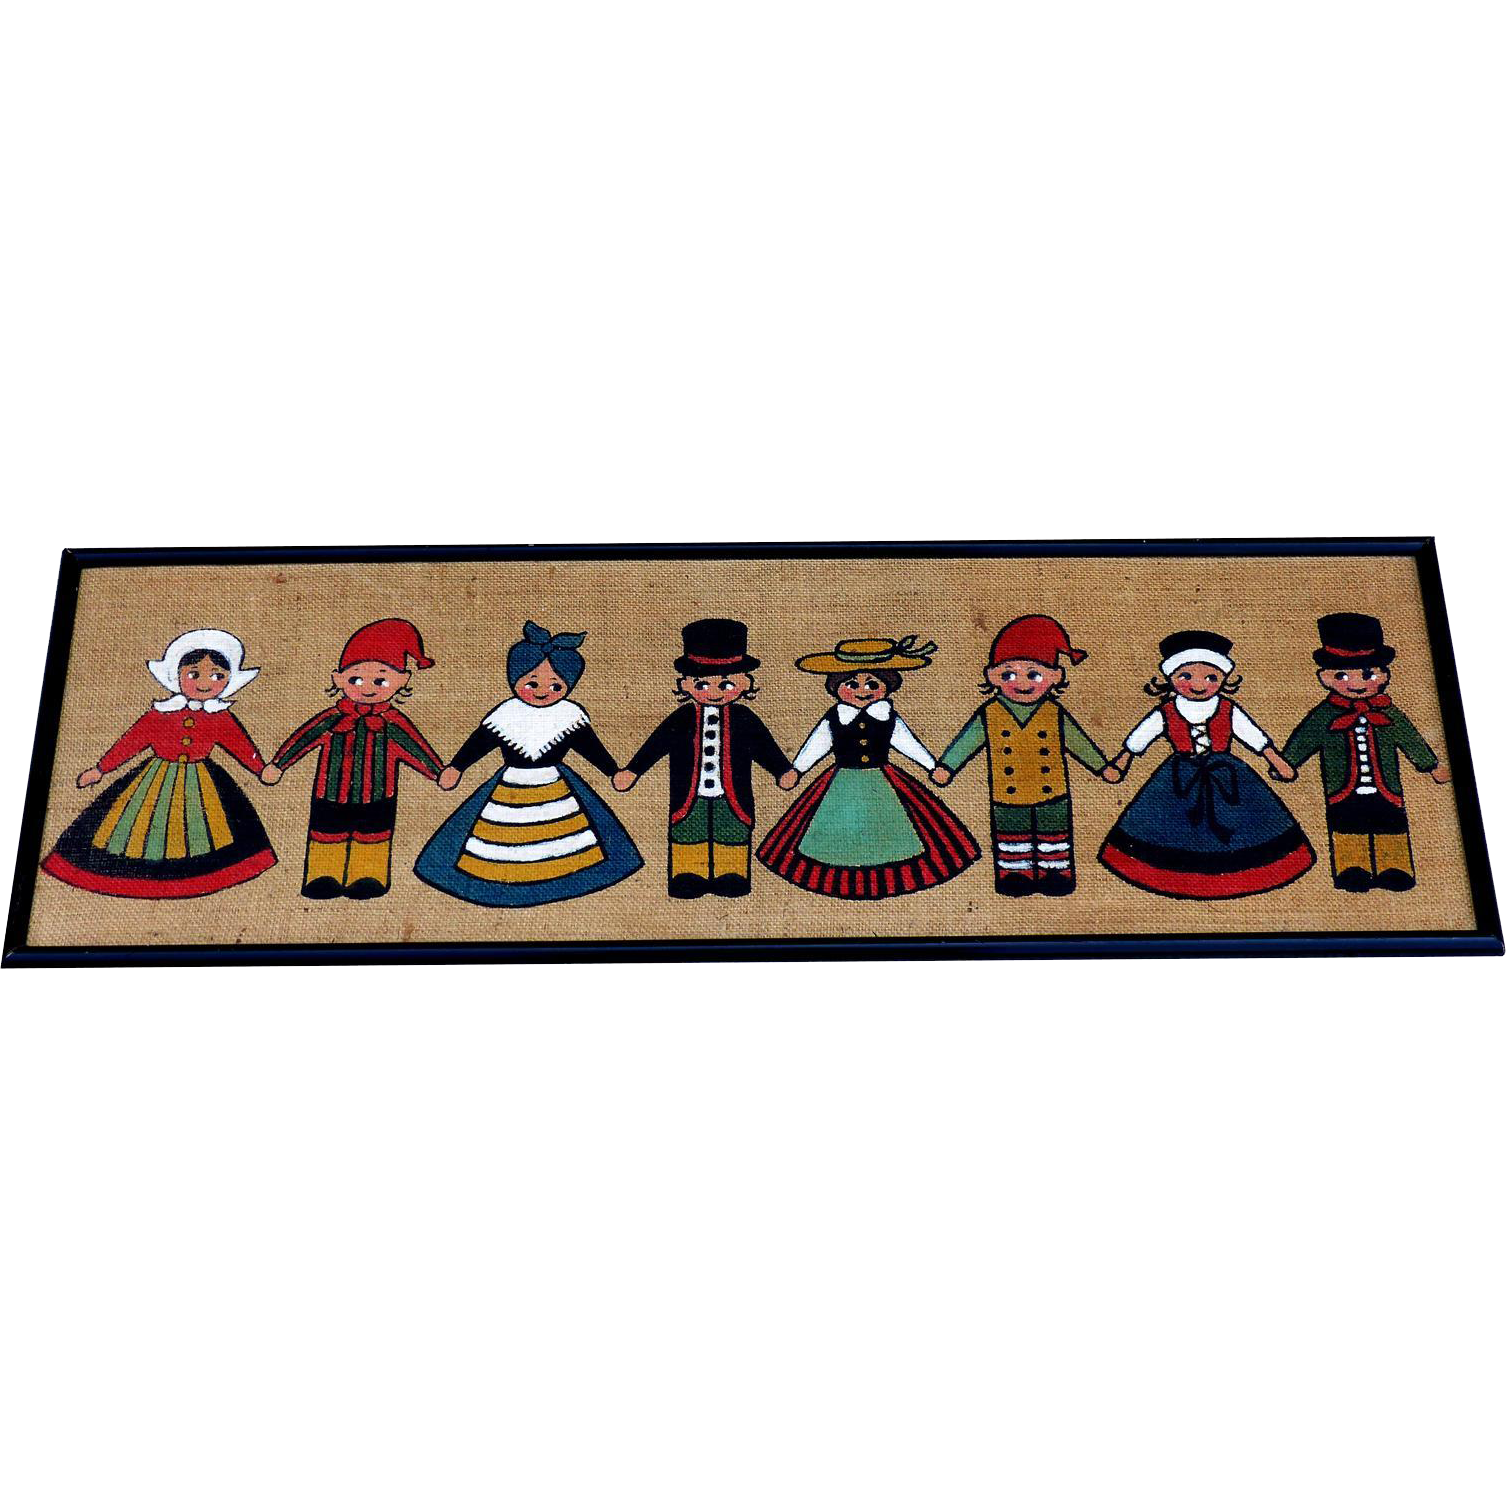 Vintage Folk Art Painting German Costumed Children Painted On Canvas